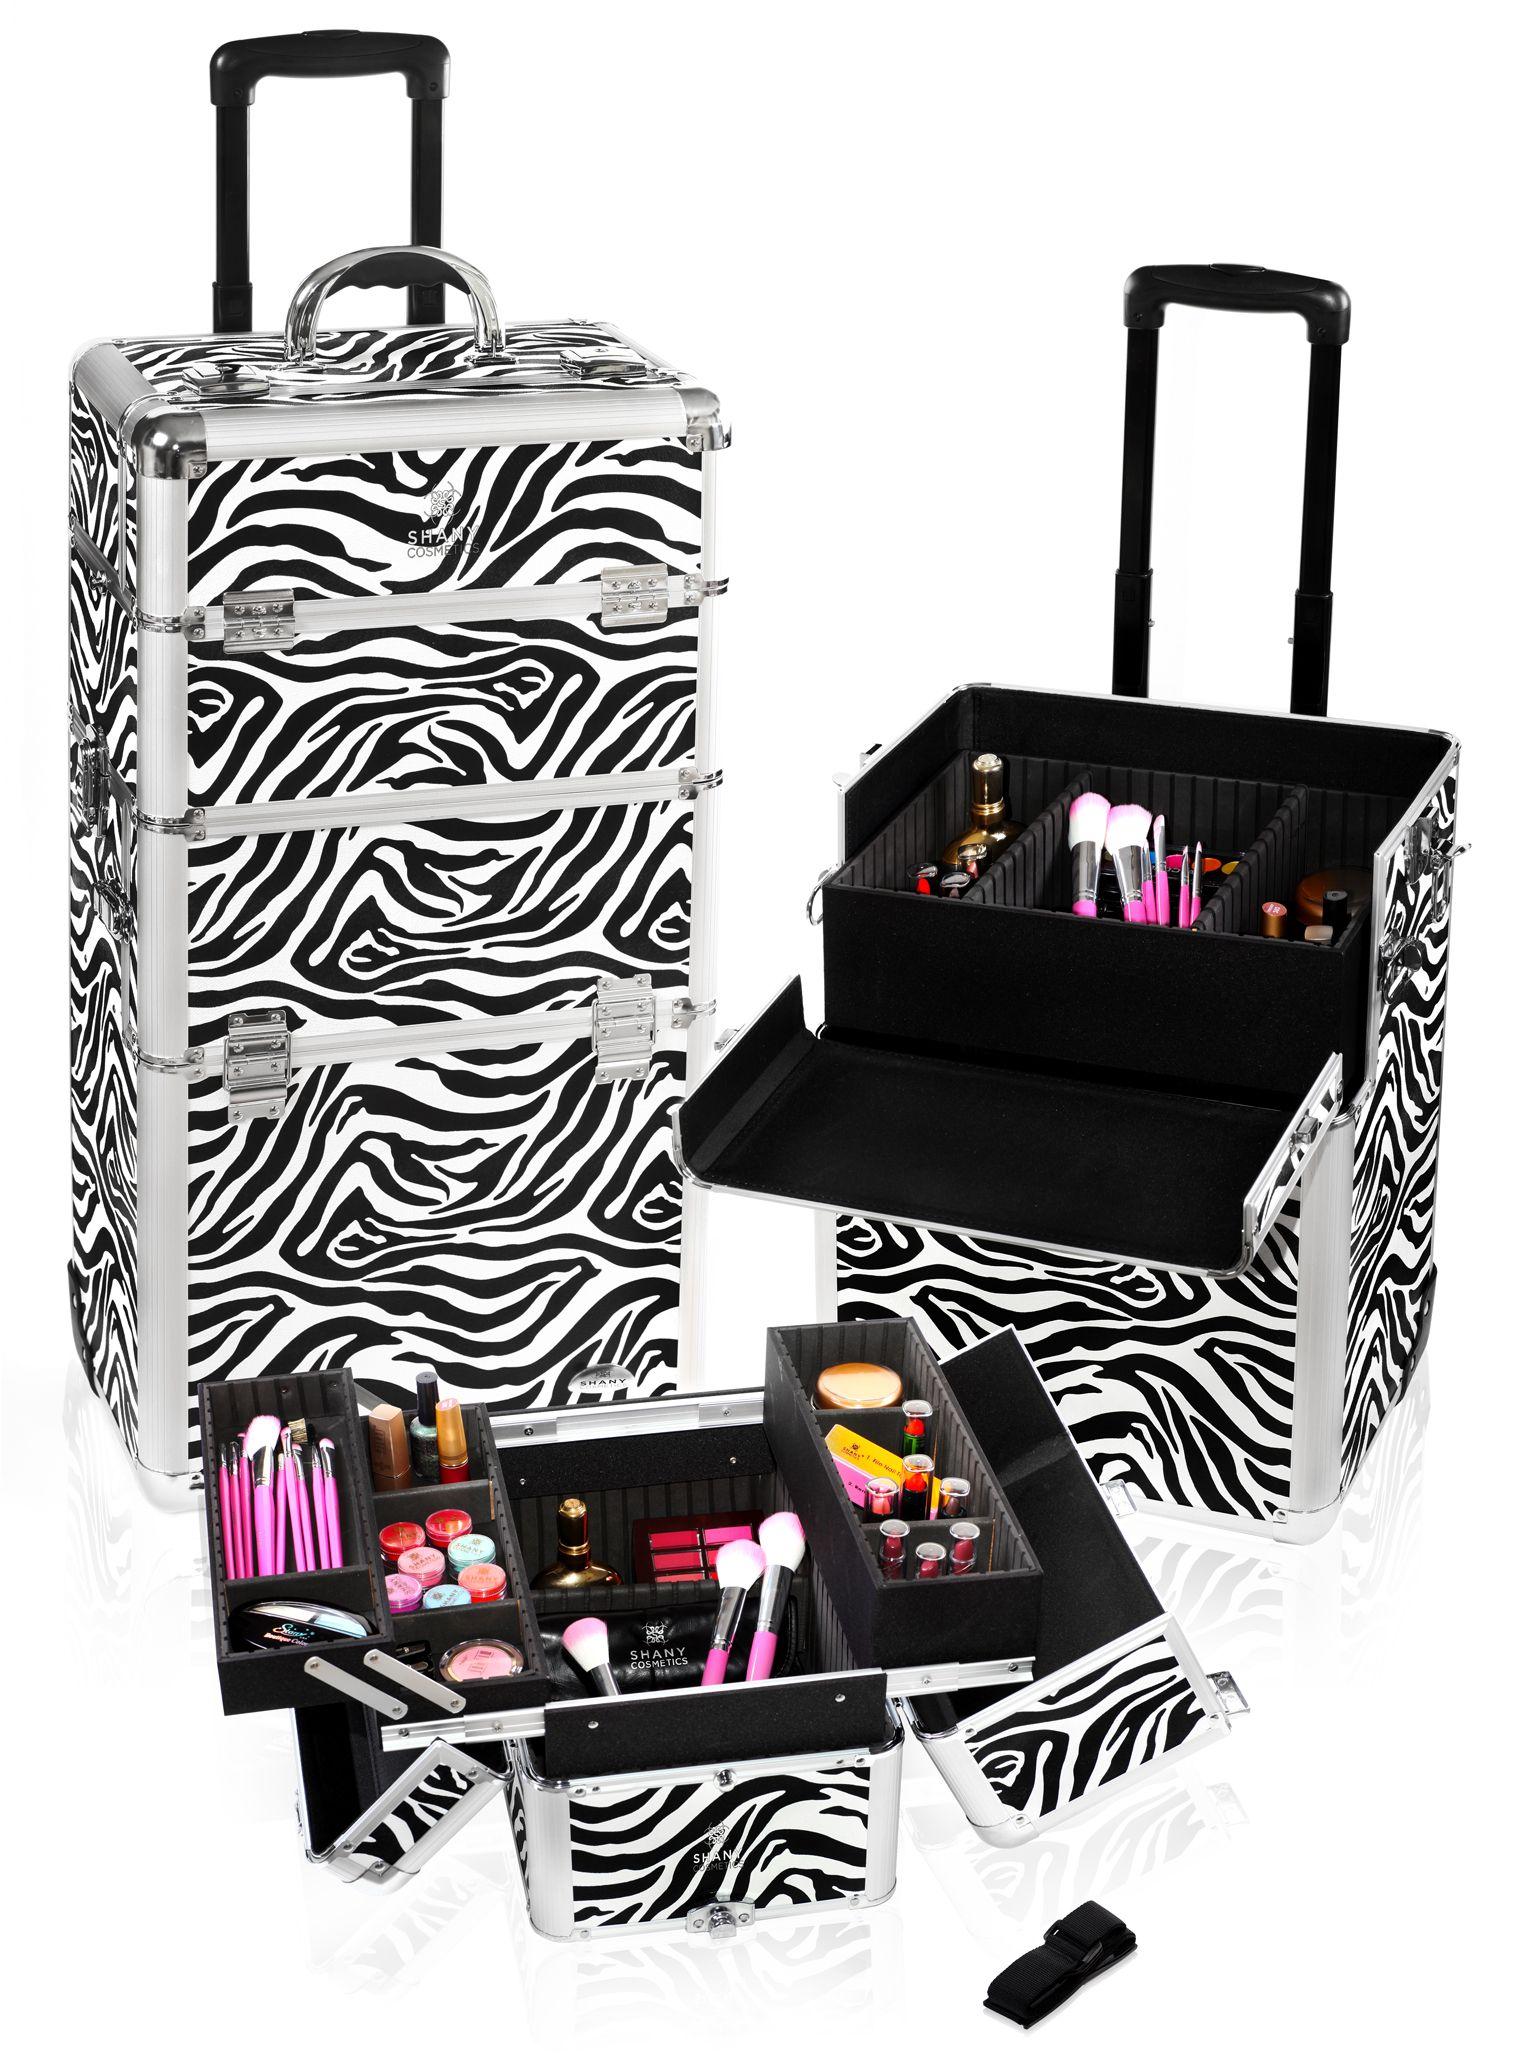 Zebra Trolley Case. 200 Makeup case, Professional